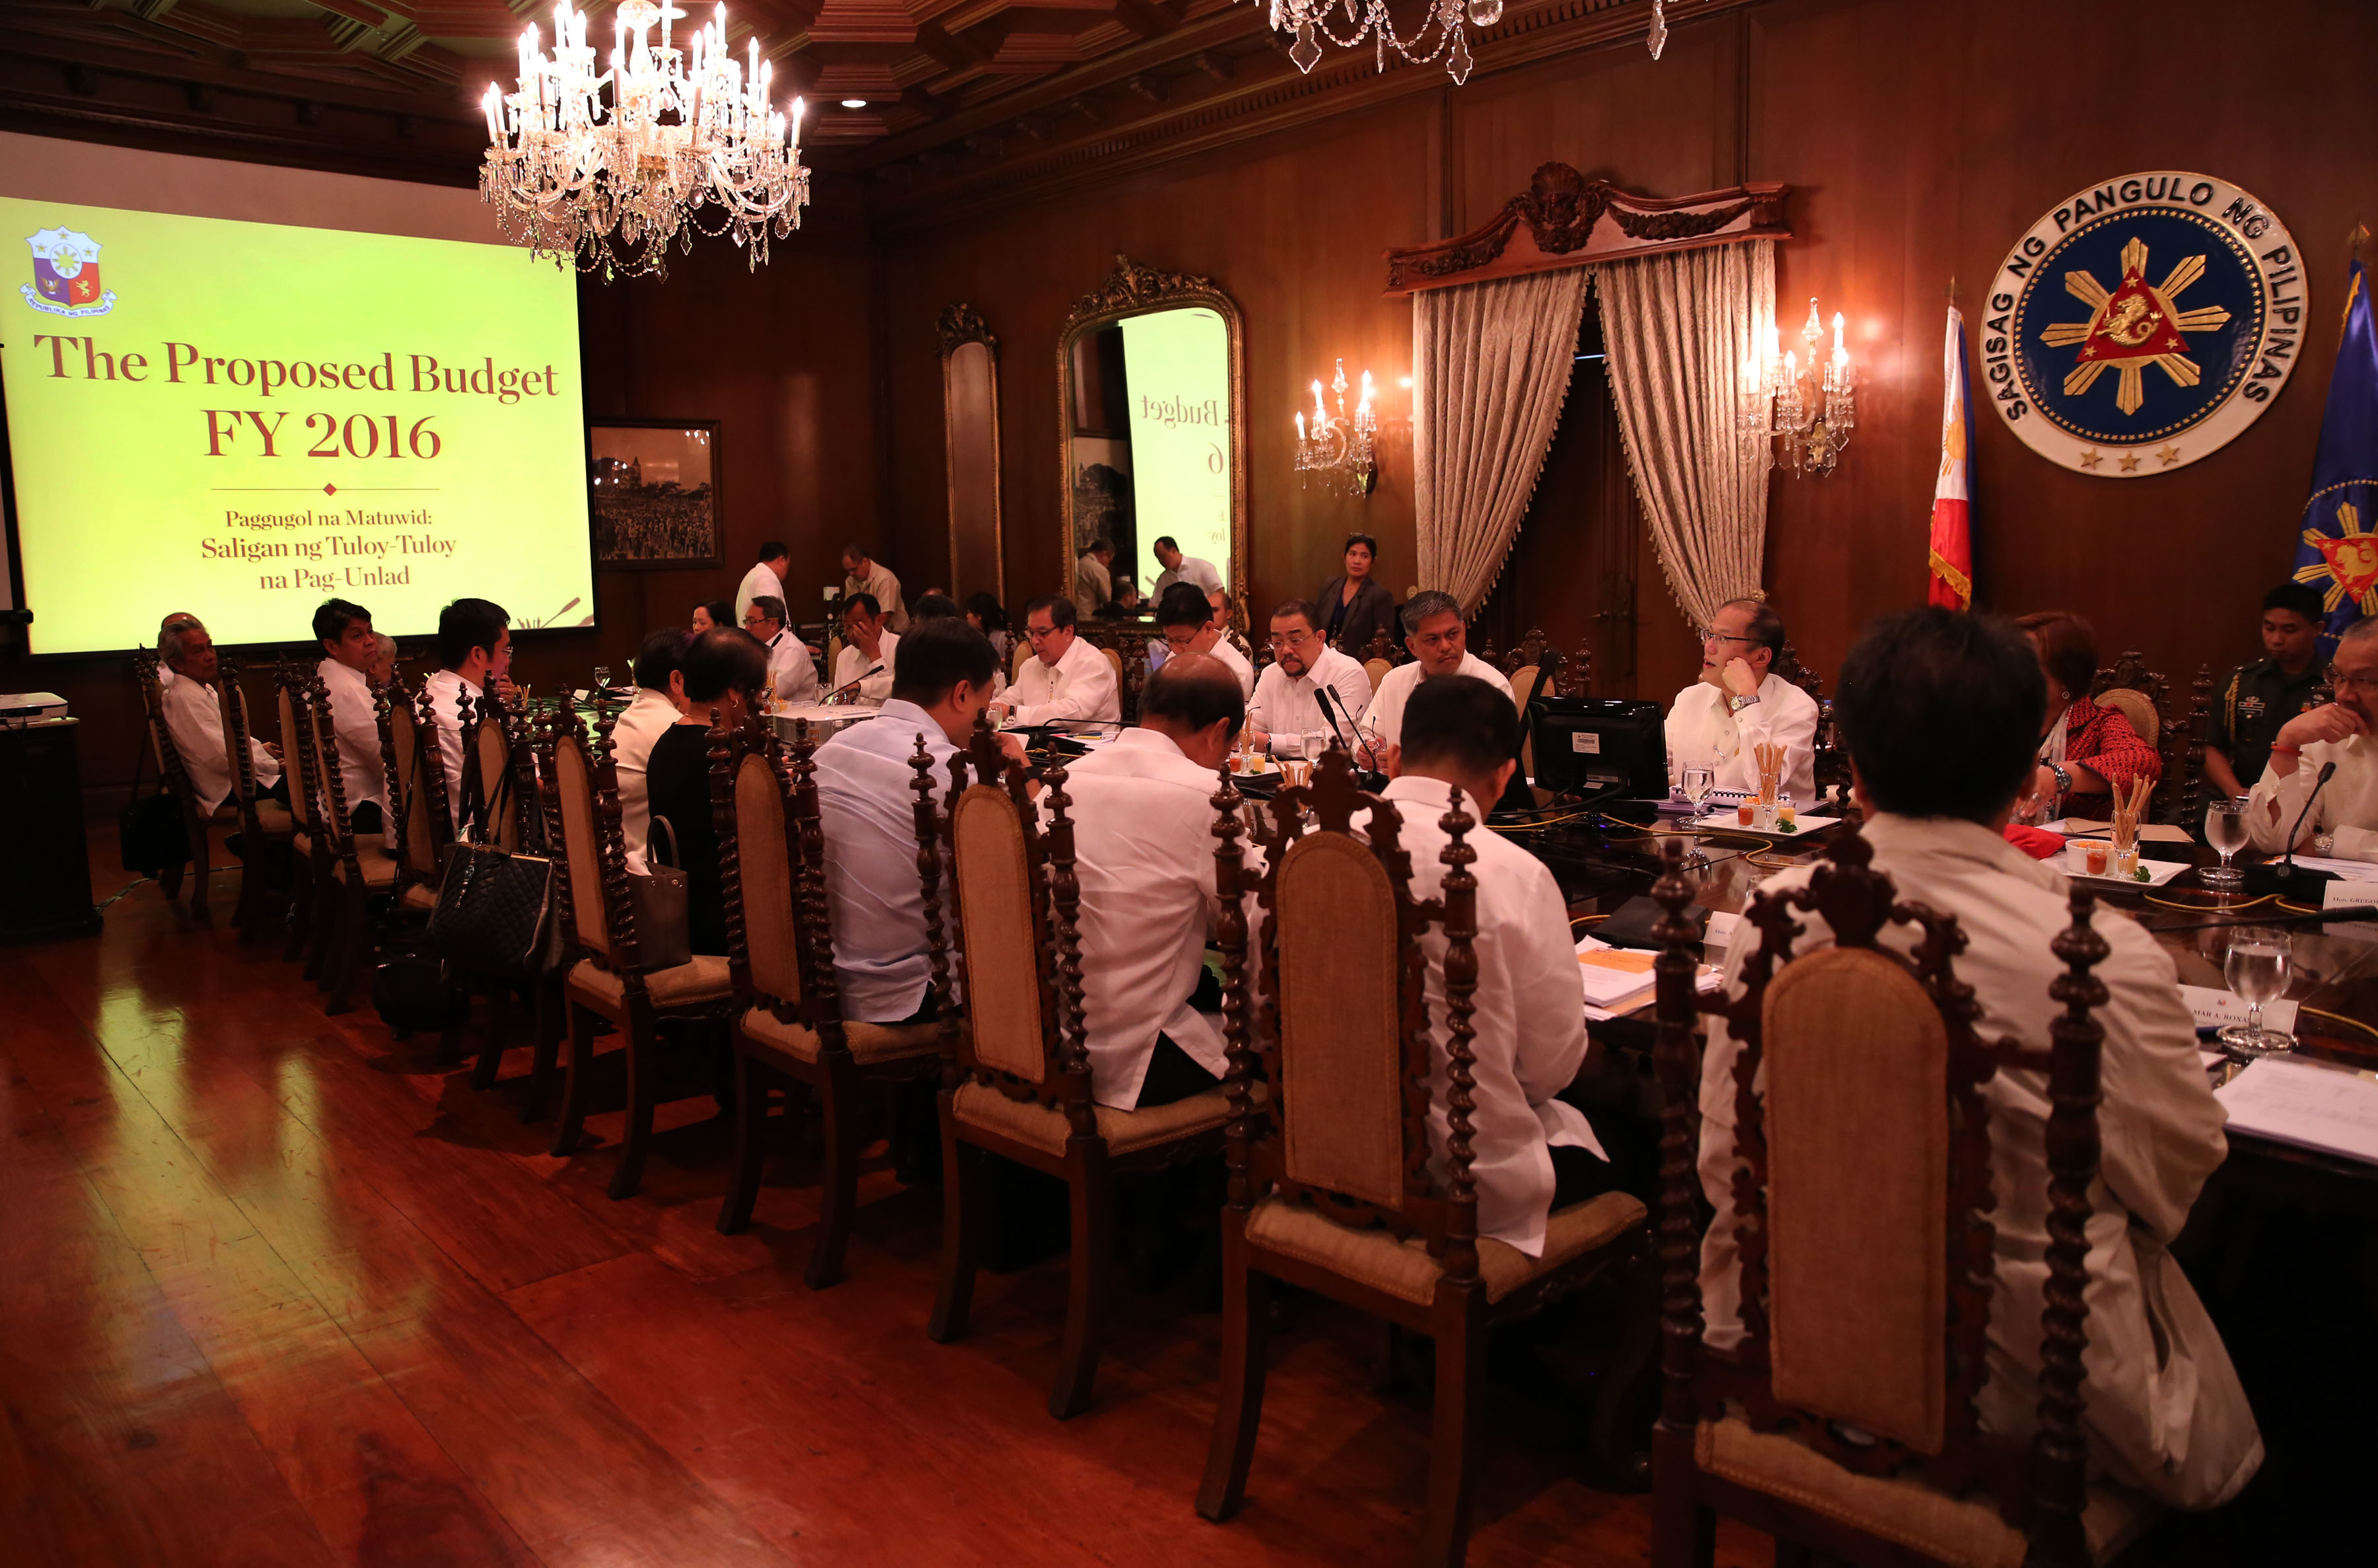 Most Aquino Cabinet members richer in 2015